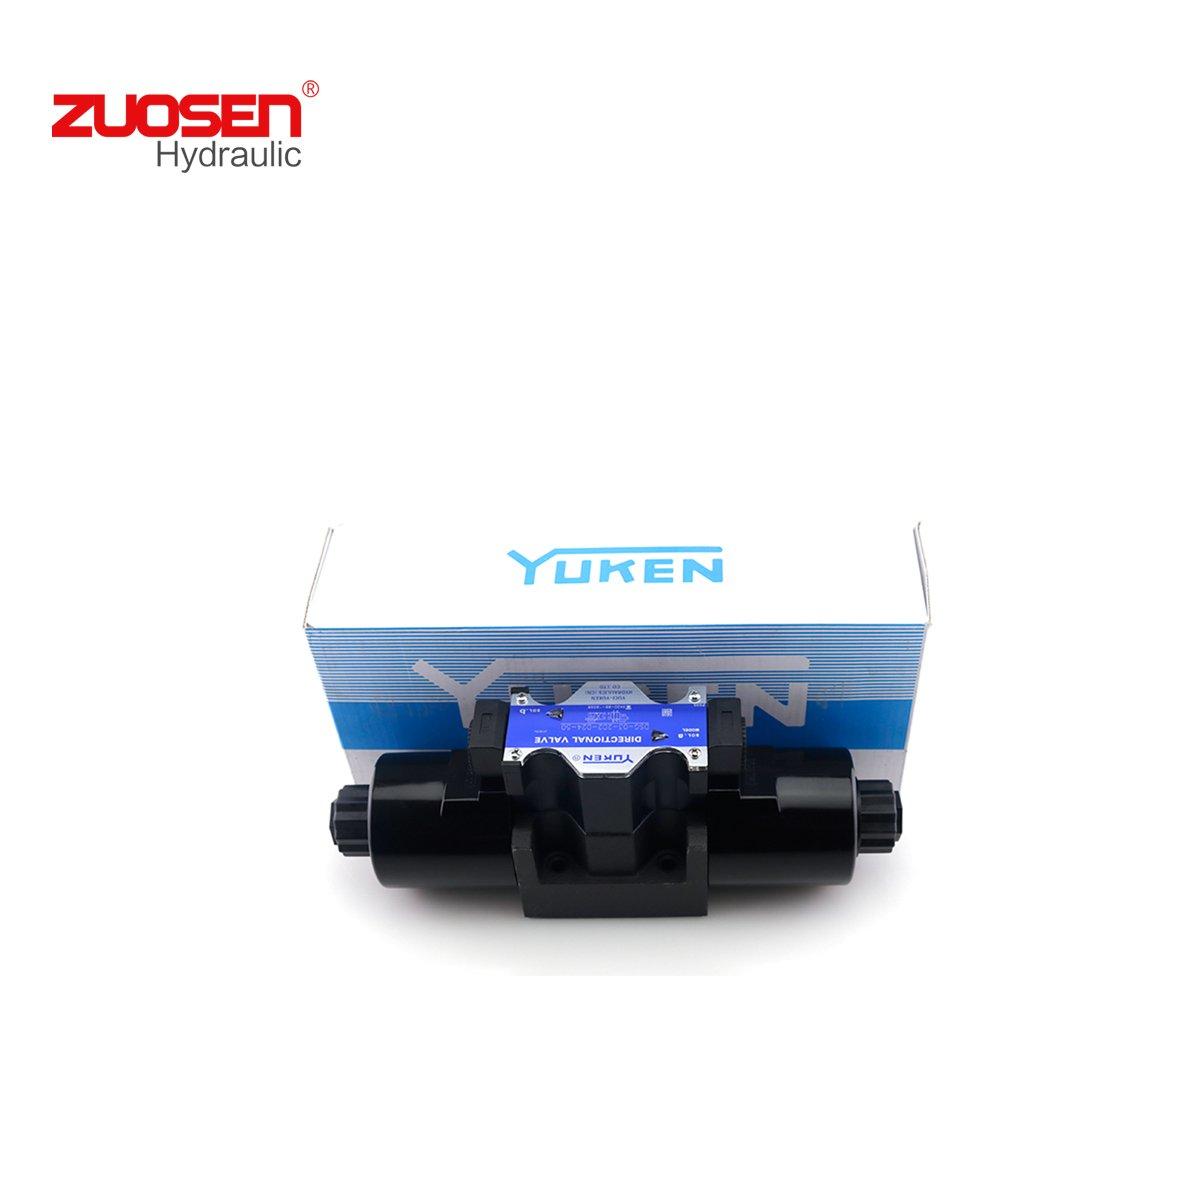 Yuken DSG-03-2D2-D24-50 Hydraulic Valves